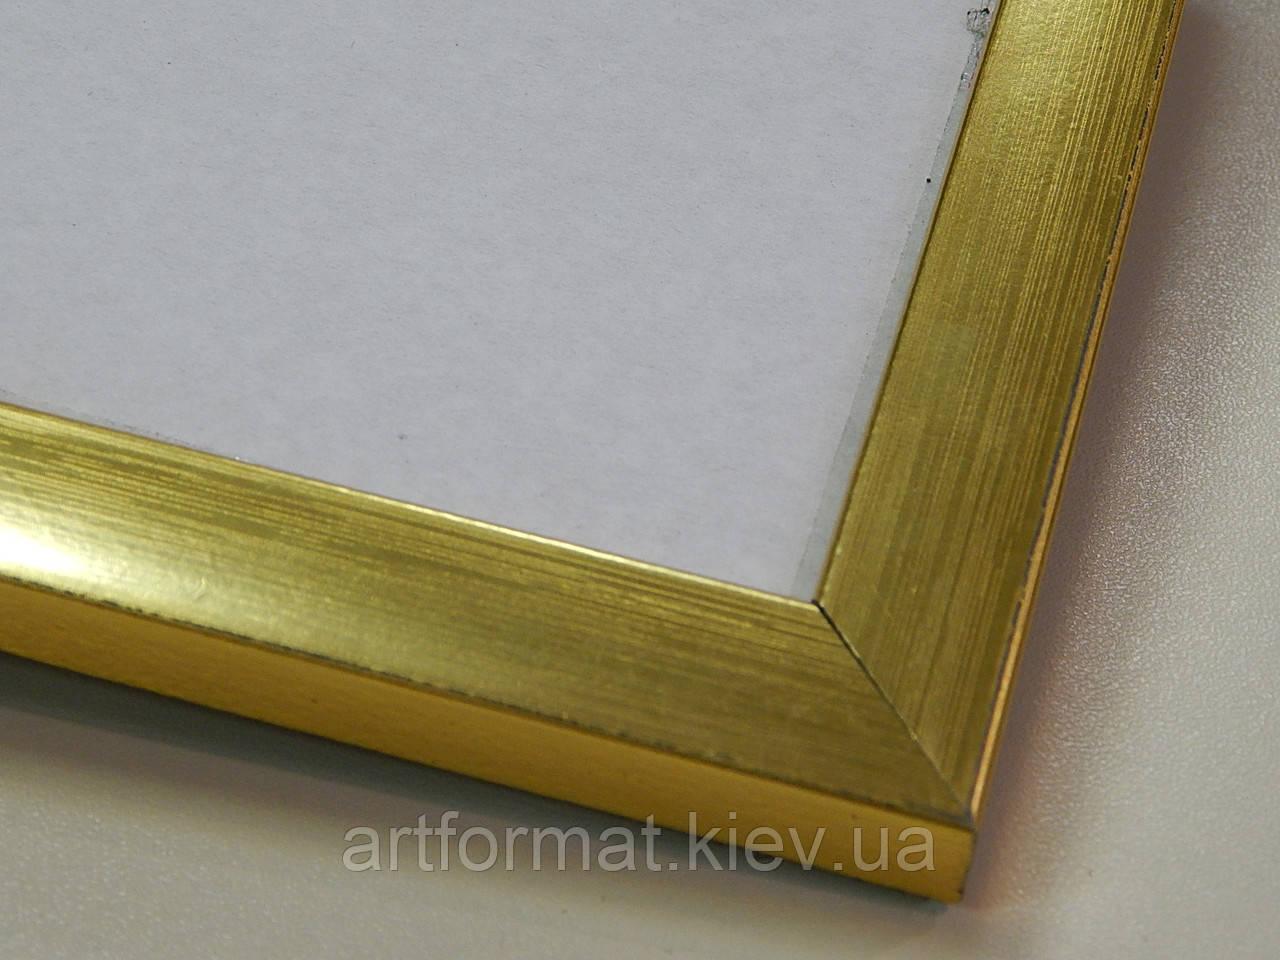 Рамка 30х40 золото.Профиль 16 мм .